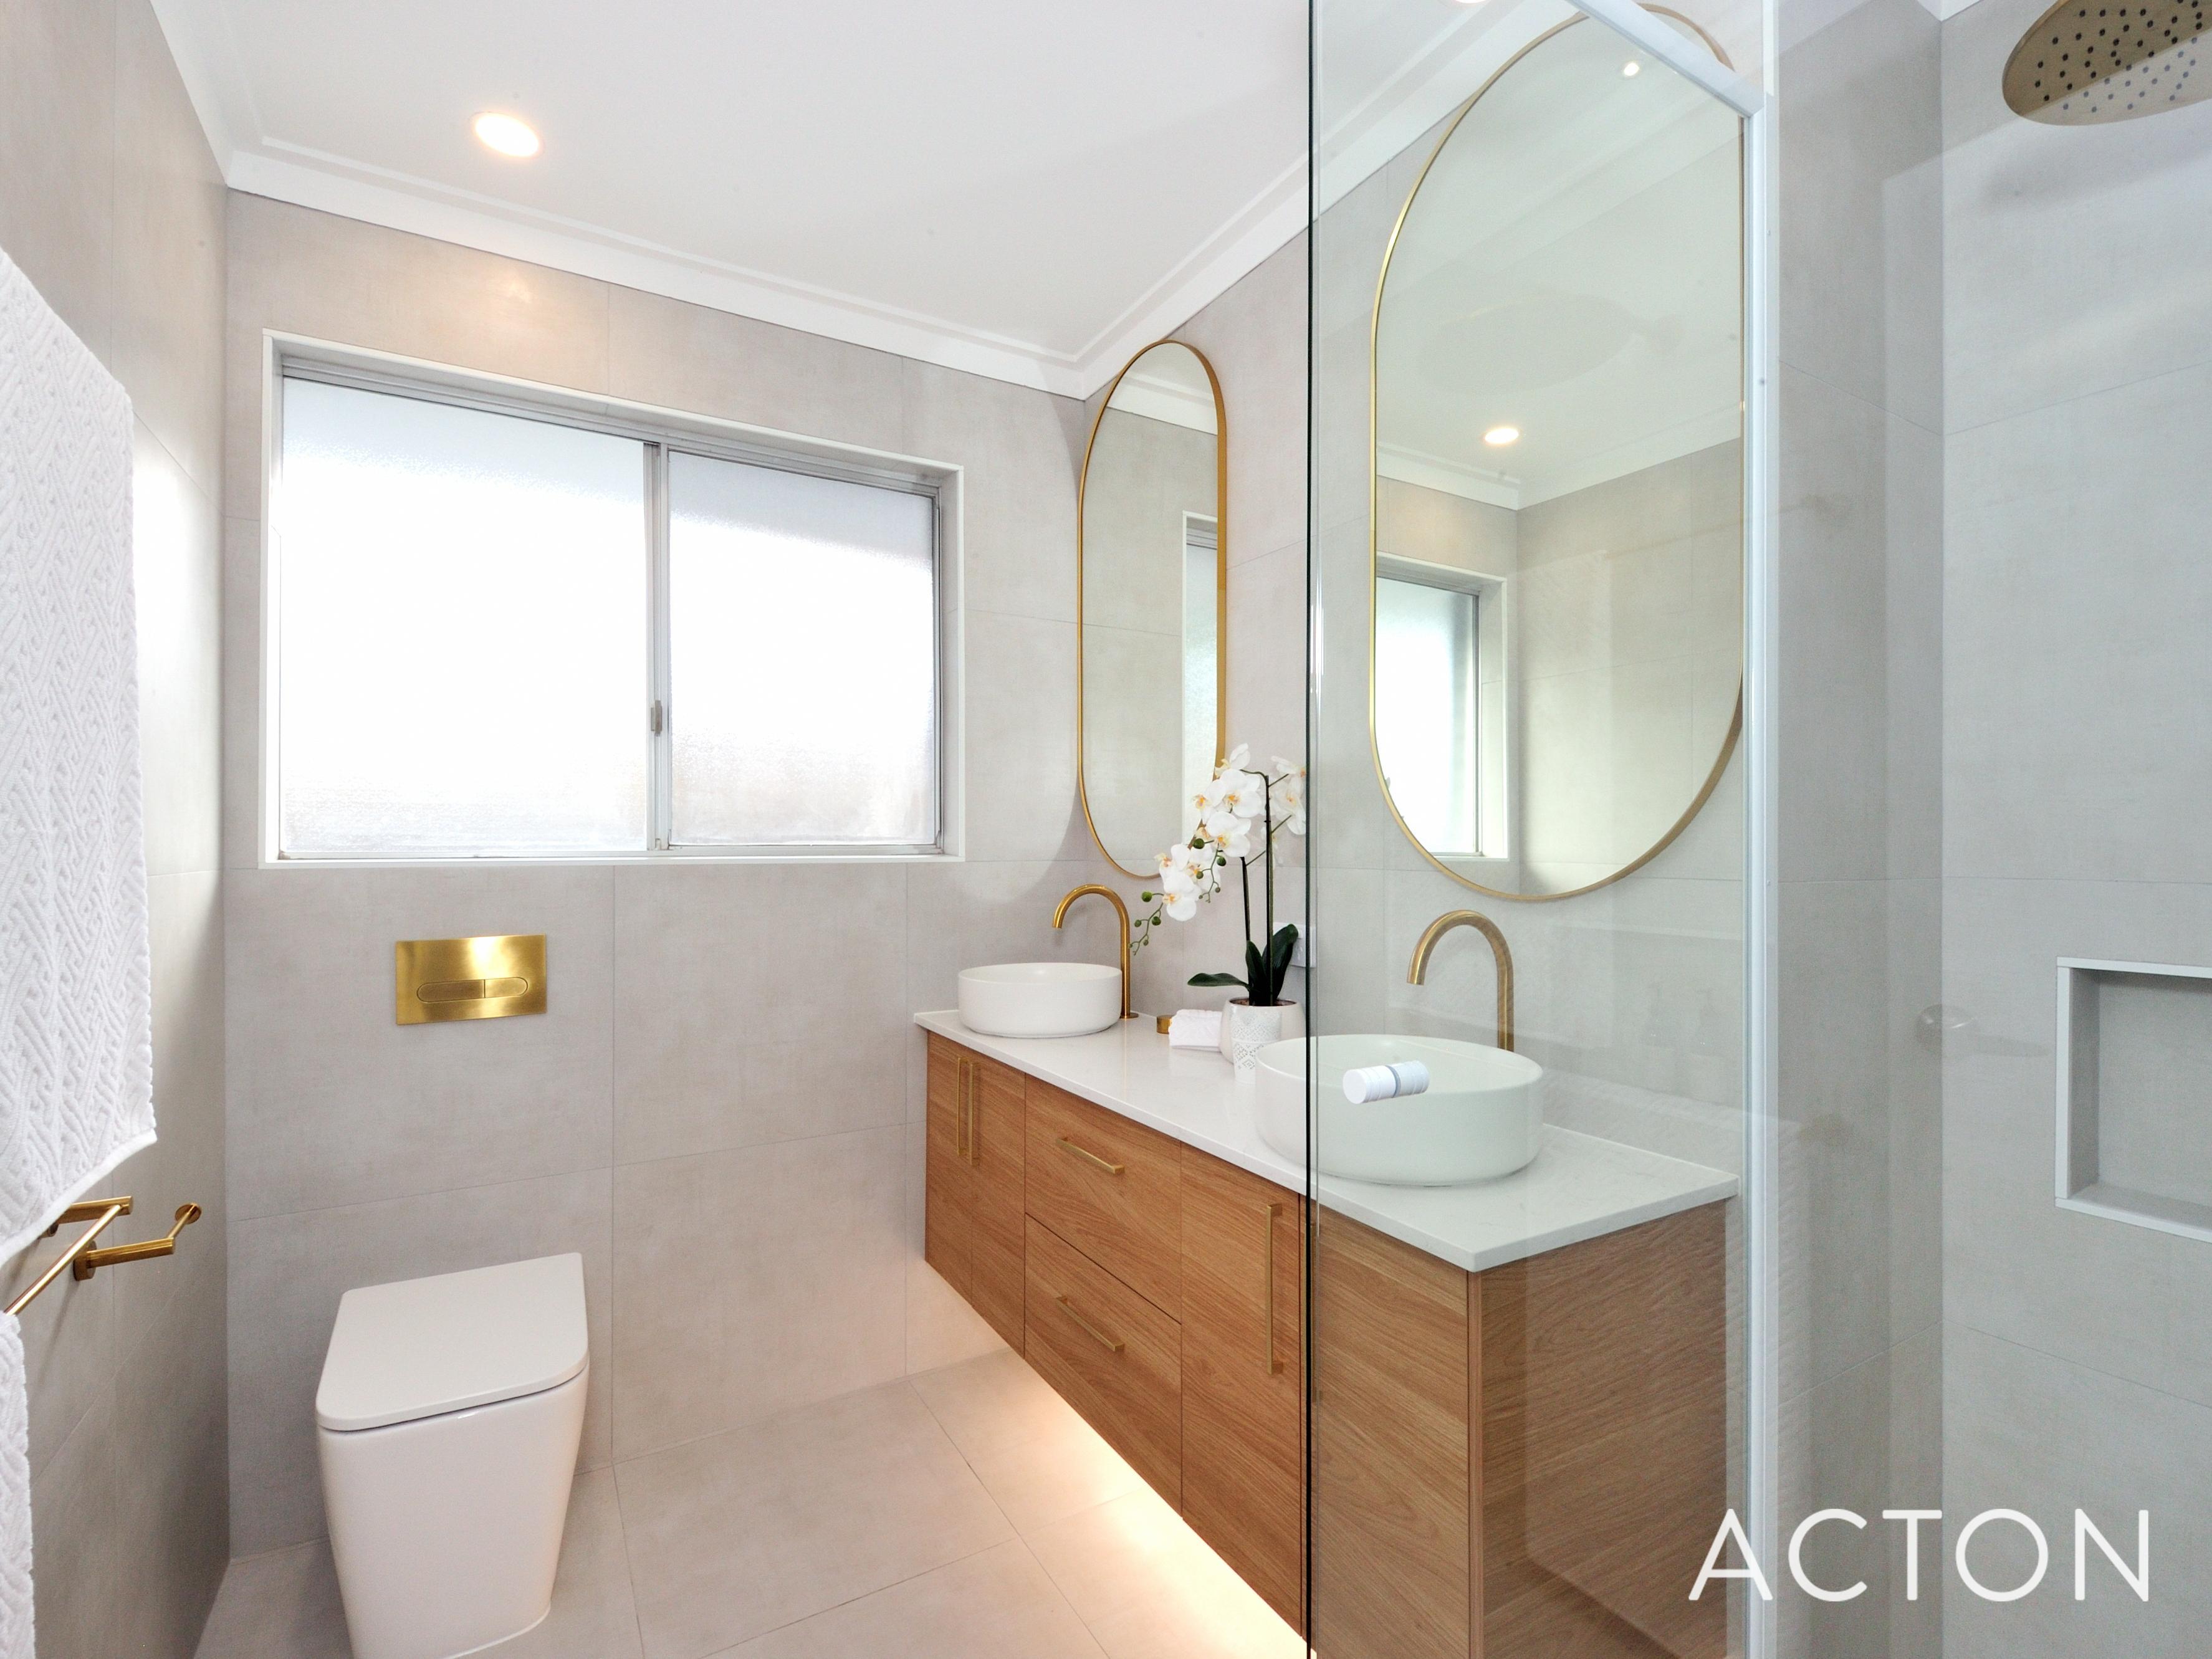 9 Ollis Street Safety Bay - House For Sale - 23034058 - ACTON Rockingham